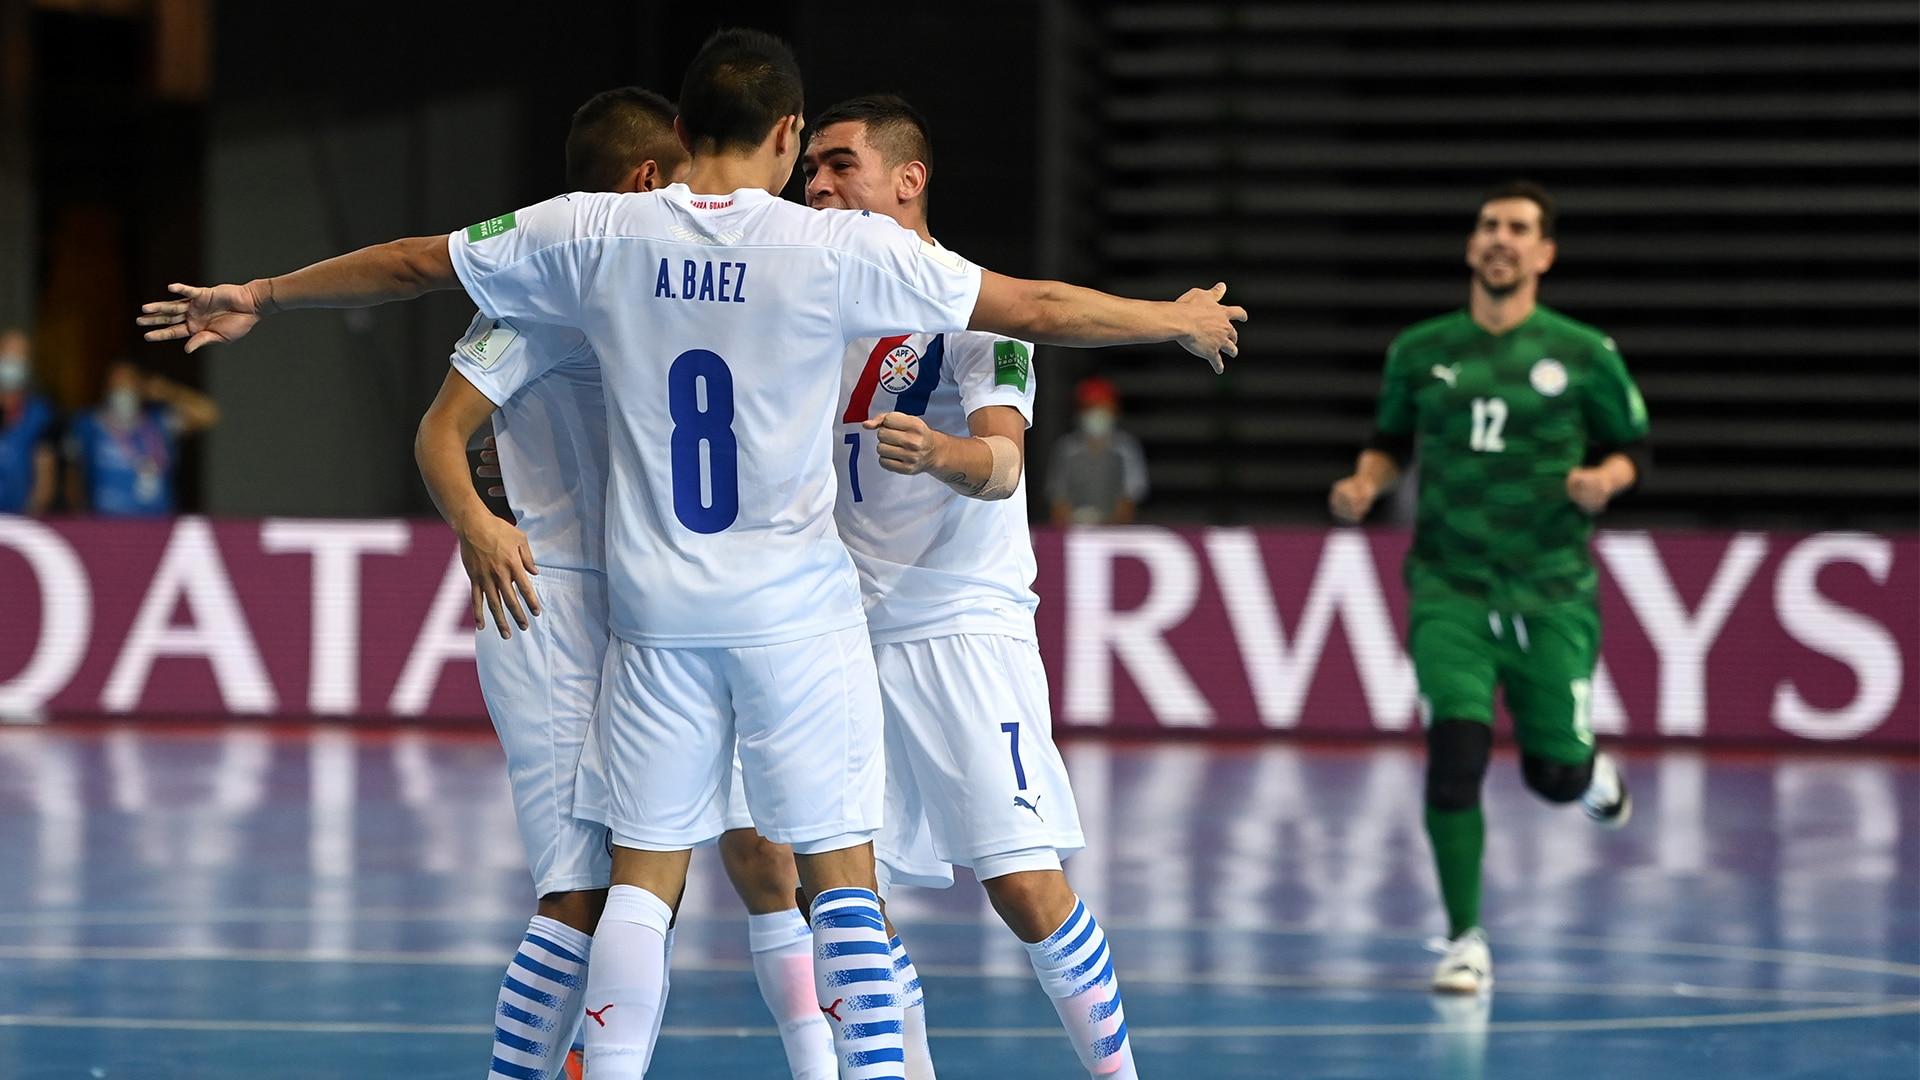 Watch FIFA Futsal World Cup Lithuania 2021 Highlight: Angola vs. Paraguay 1-4 - NBC.com